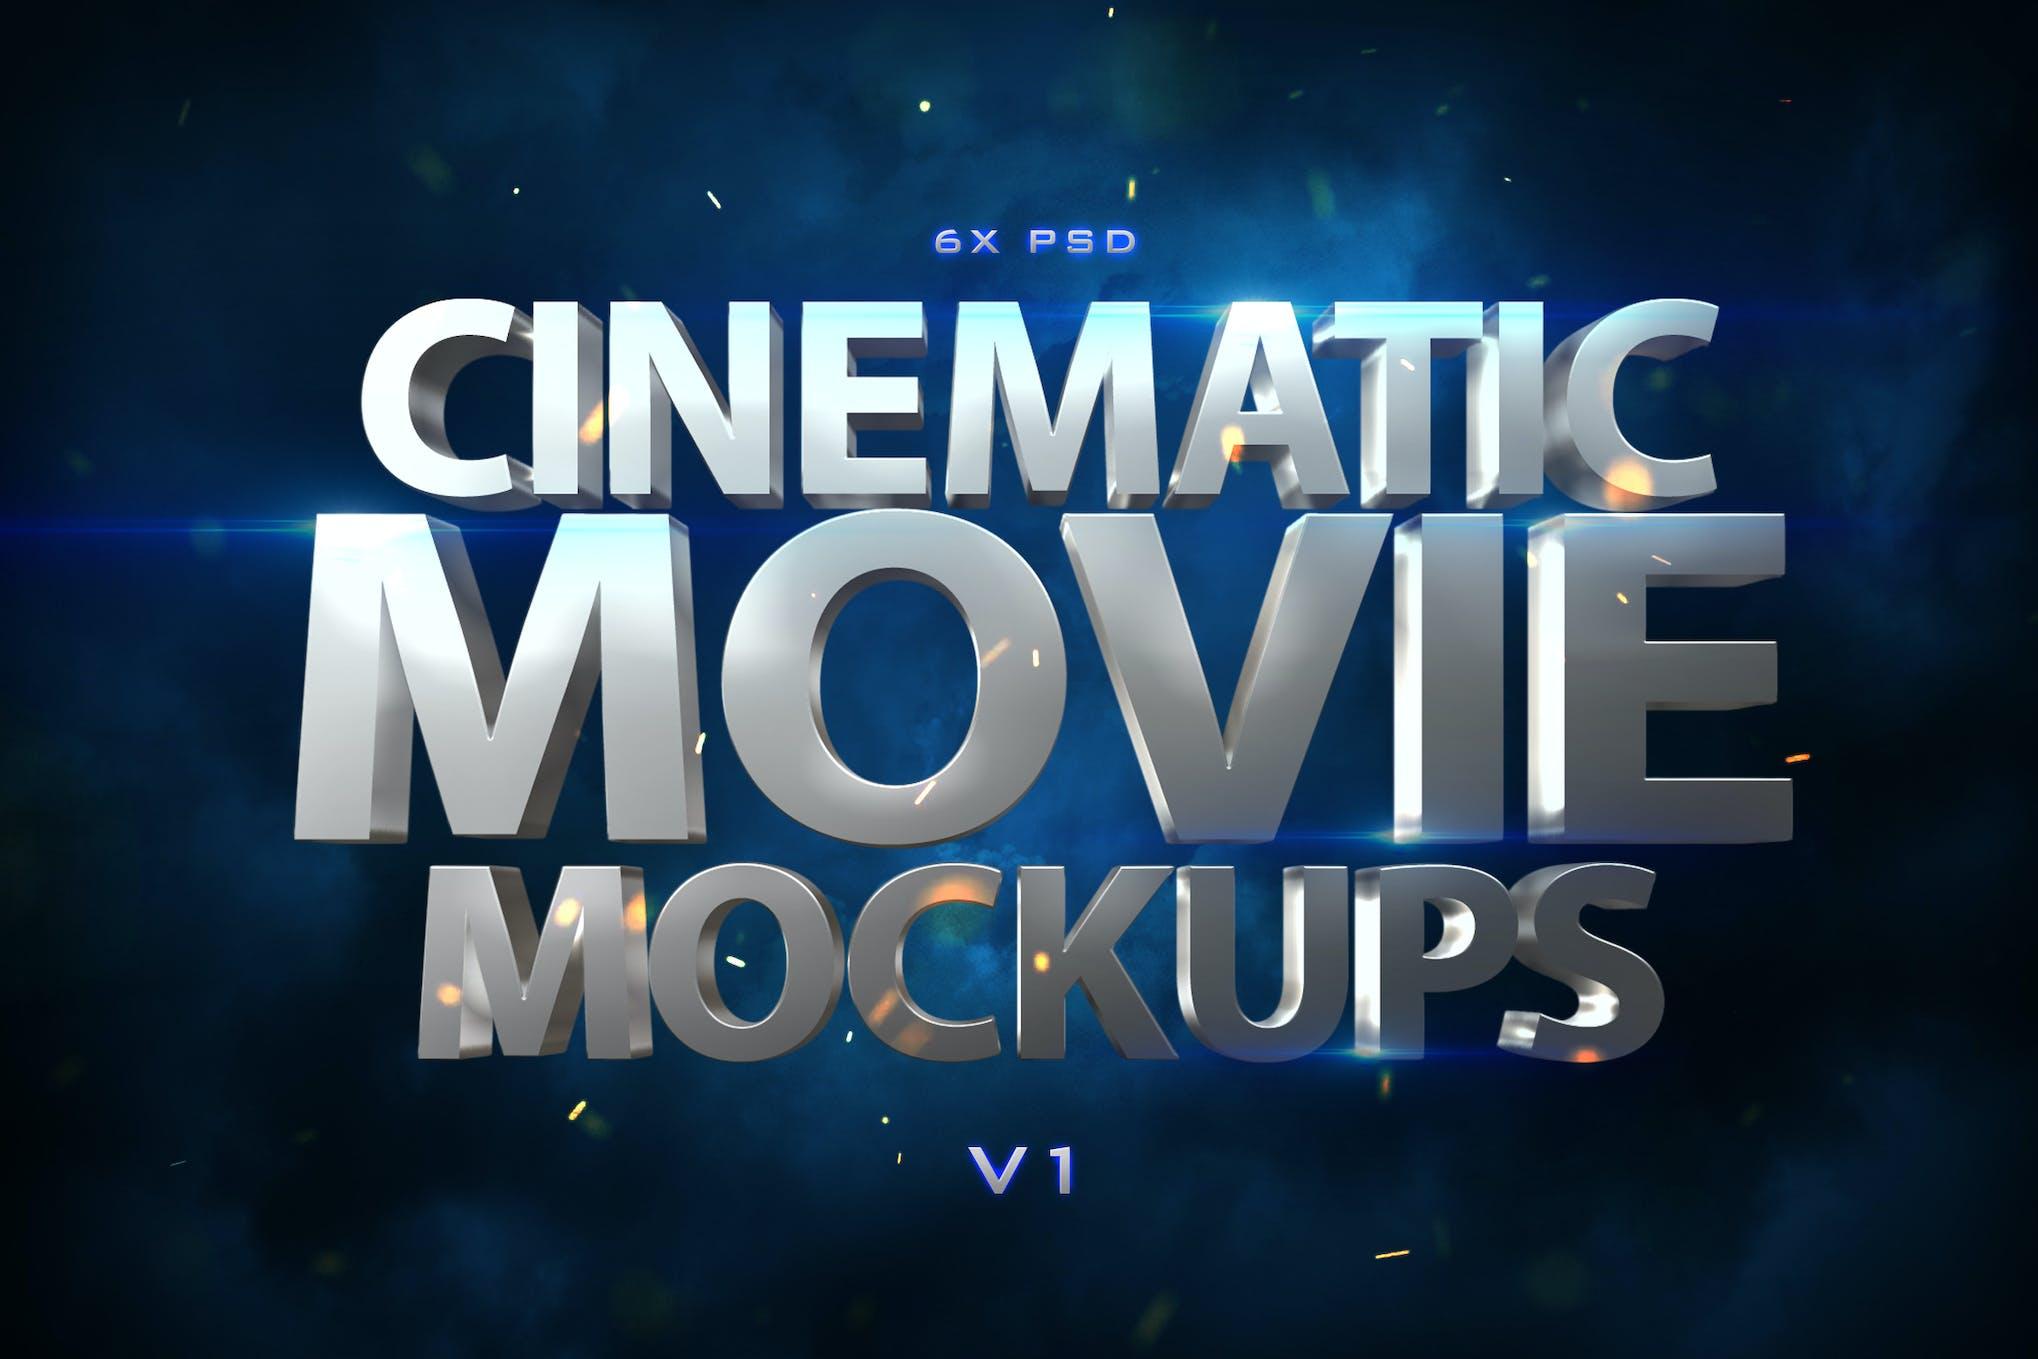 Pro 3D Text Mockups by designercow on Envato Elements